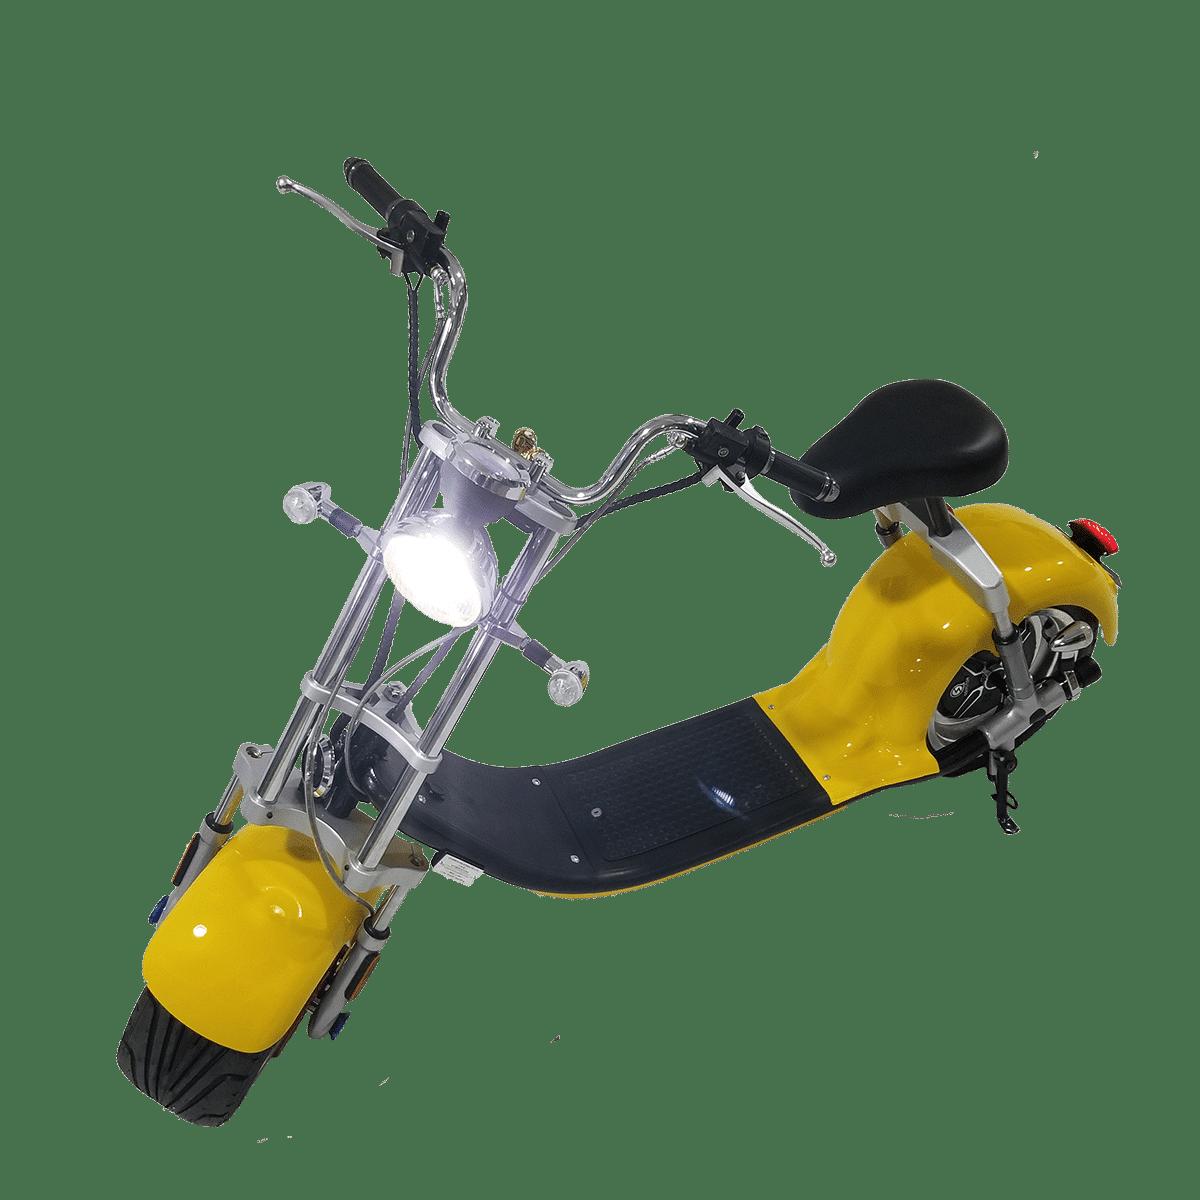 Citycoco Harley Deluxe Jaune avec 1 batterie offerte en plus 2